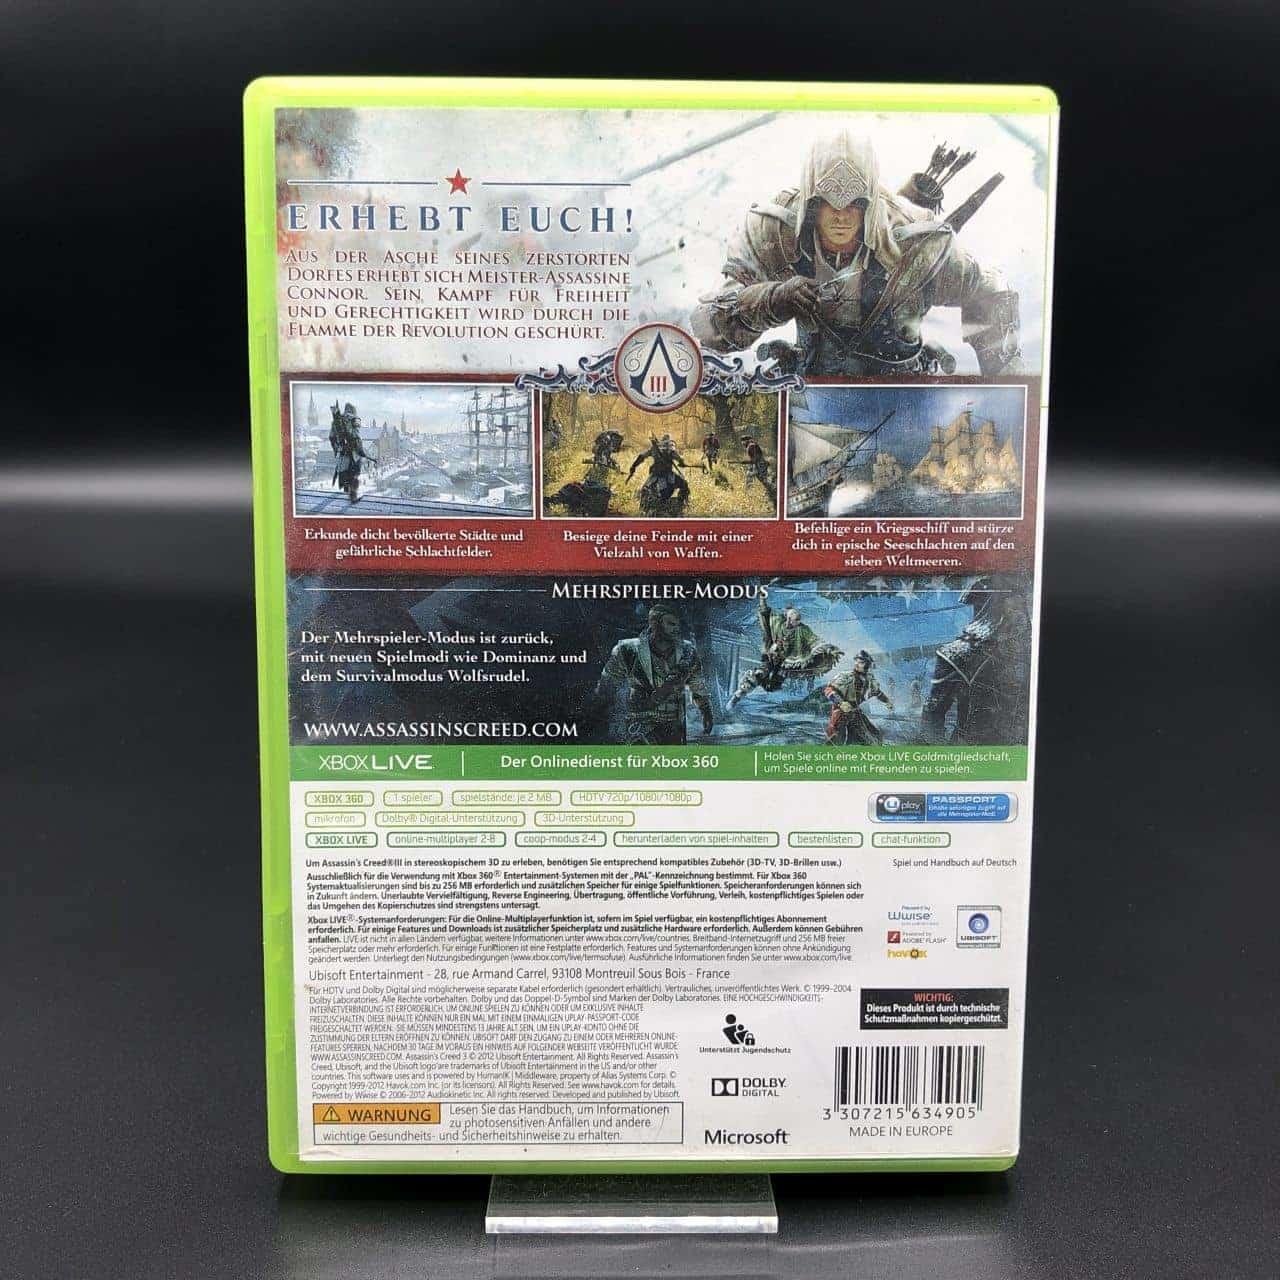 Assassin's Creed III (Komplett) (Gut) XBOX 360